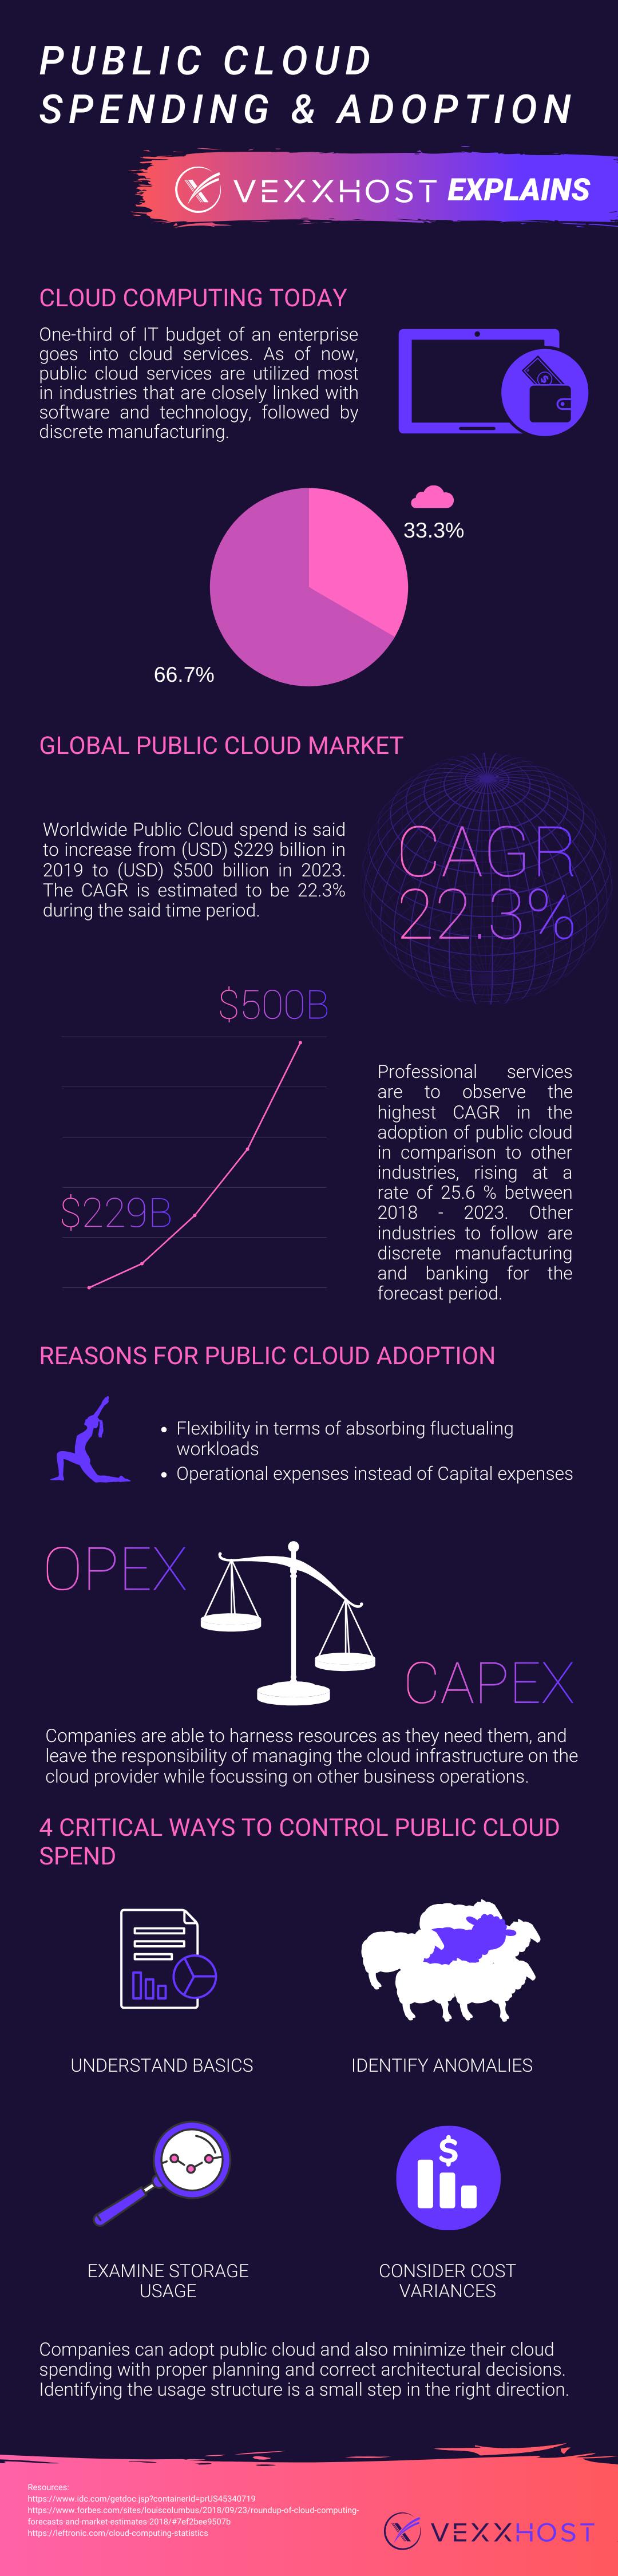 public cloud spend